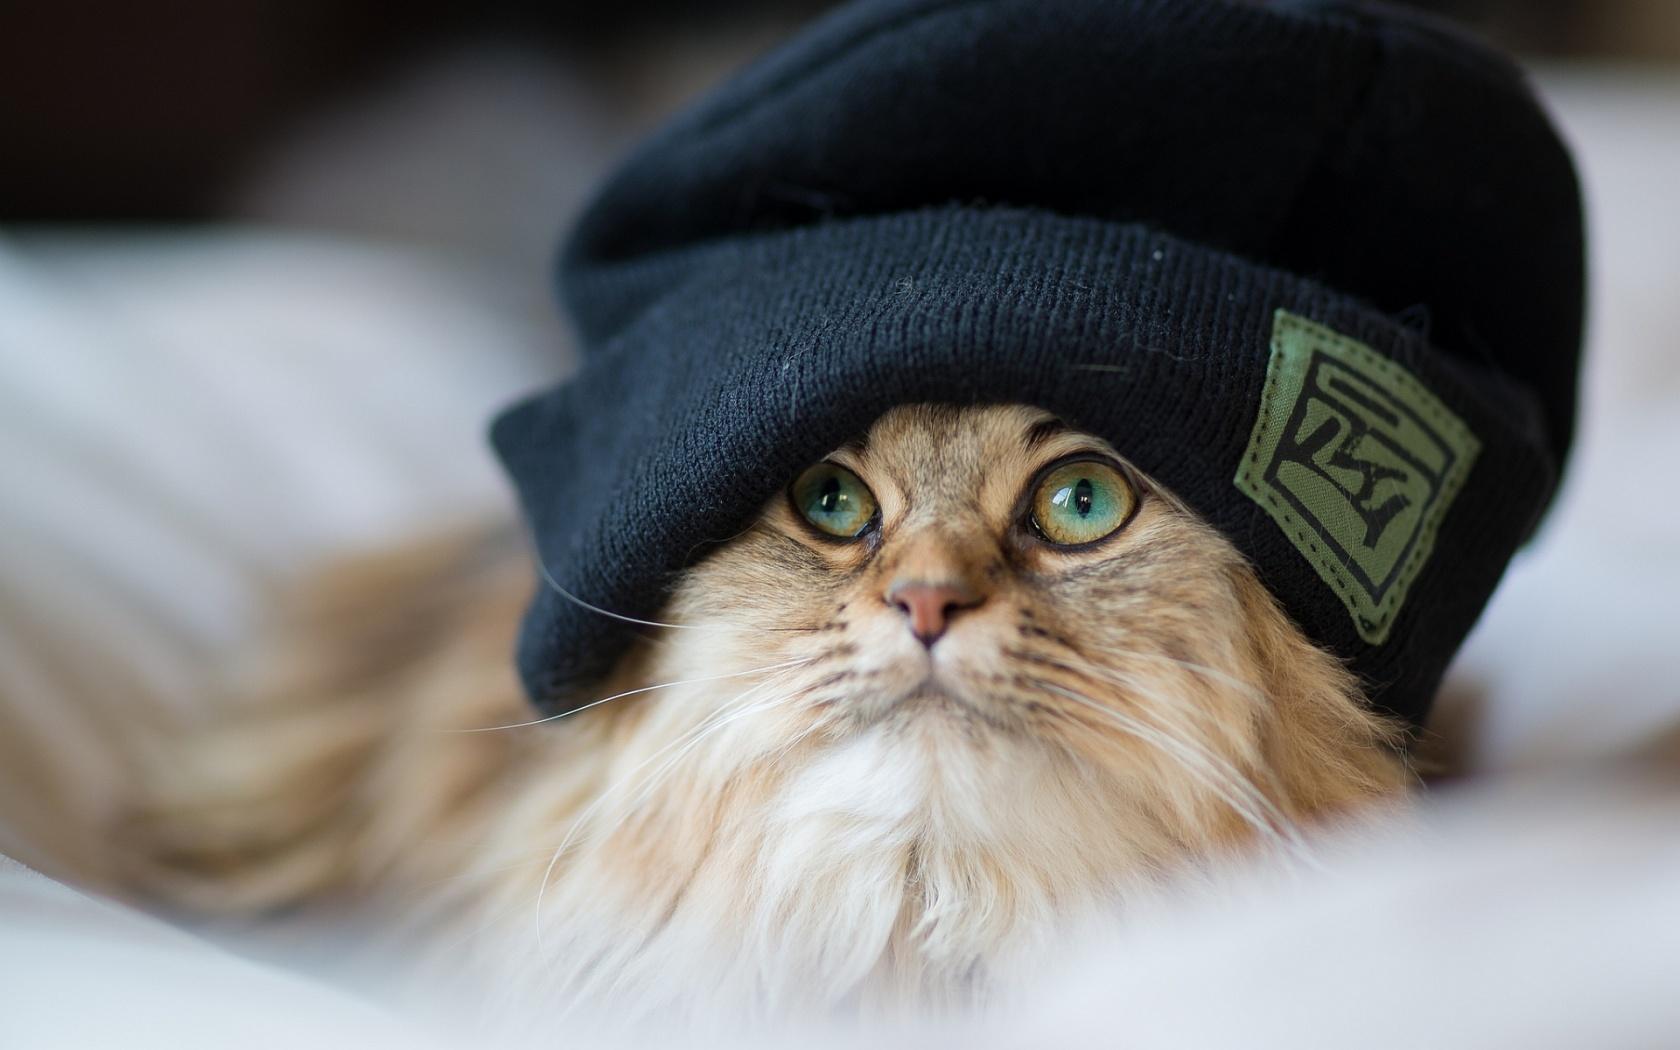 Cute Cat Headdress Wallpaper 44549